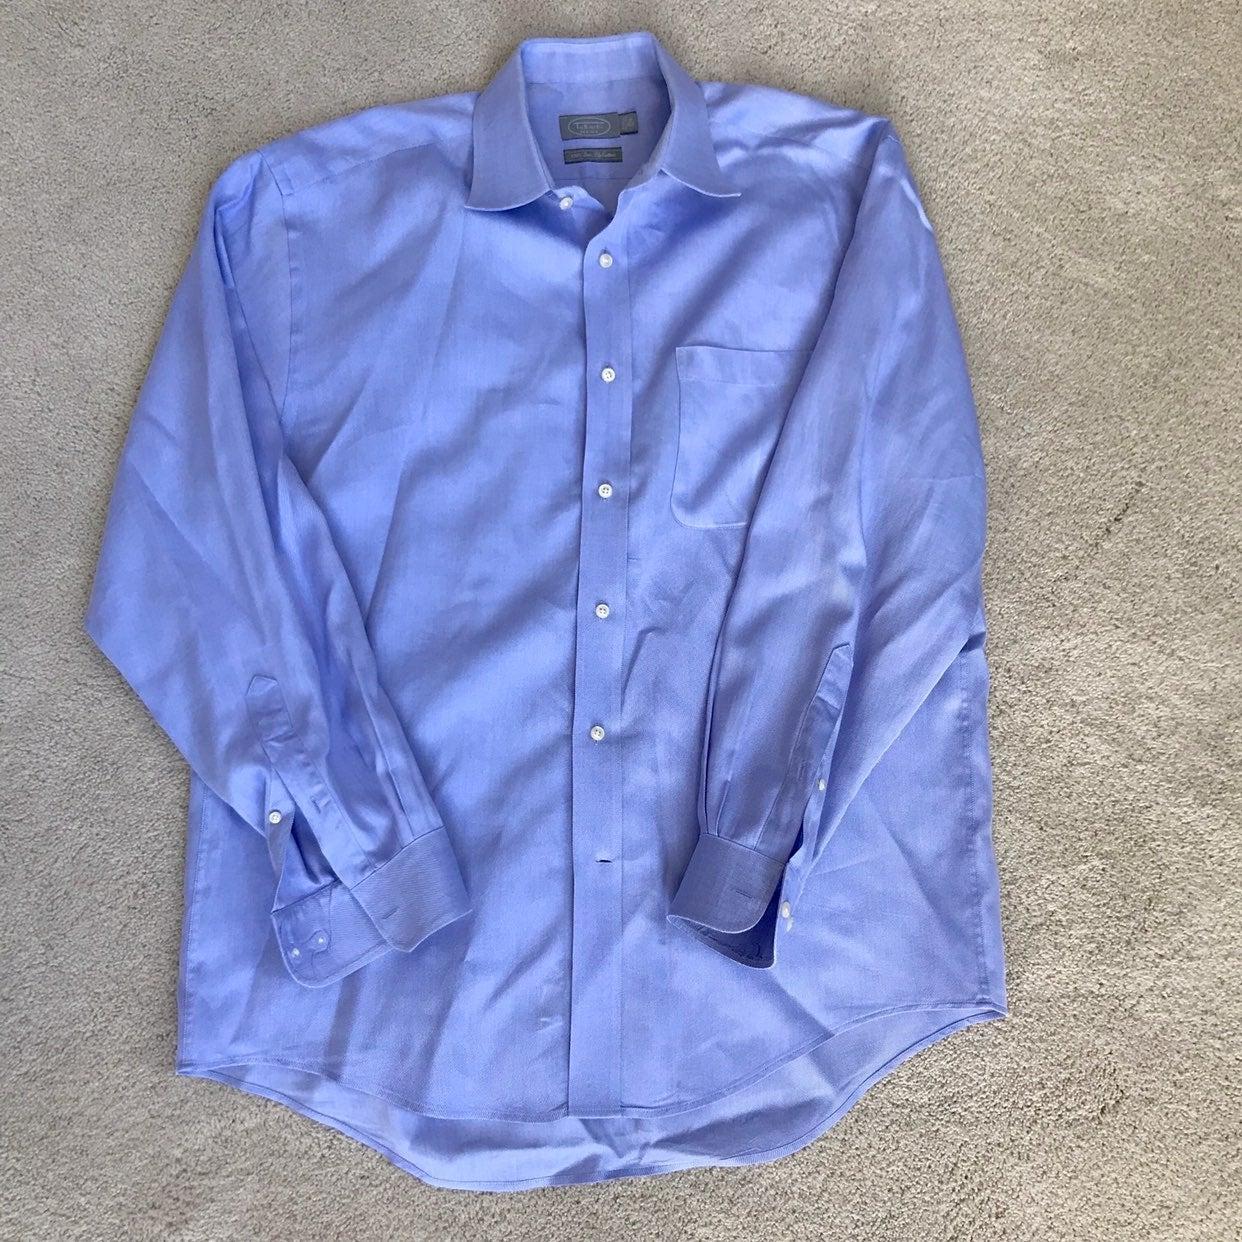 Talbots blue Dress Shirt 16-1/2, 34/35